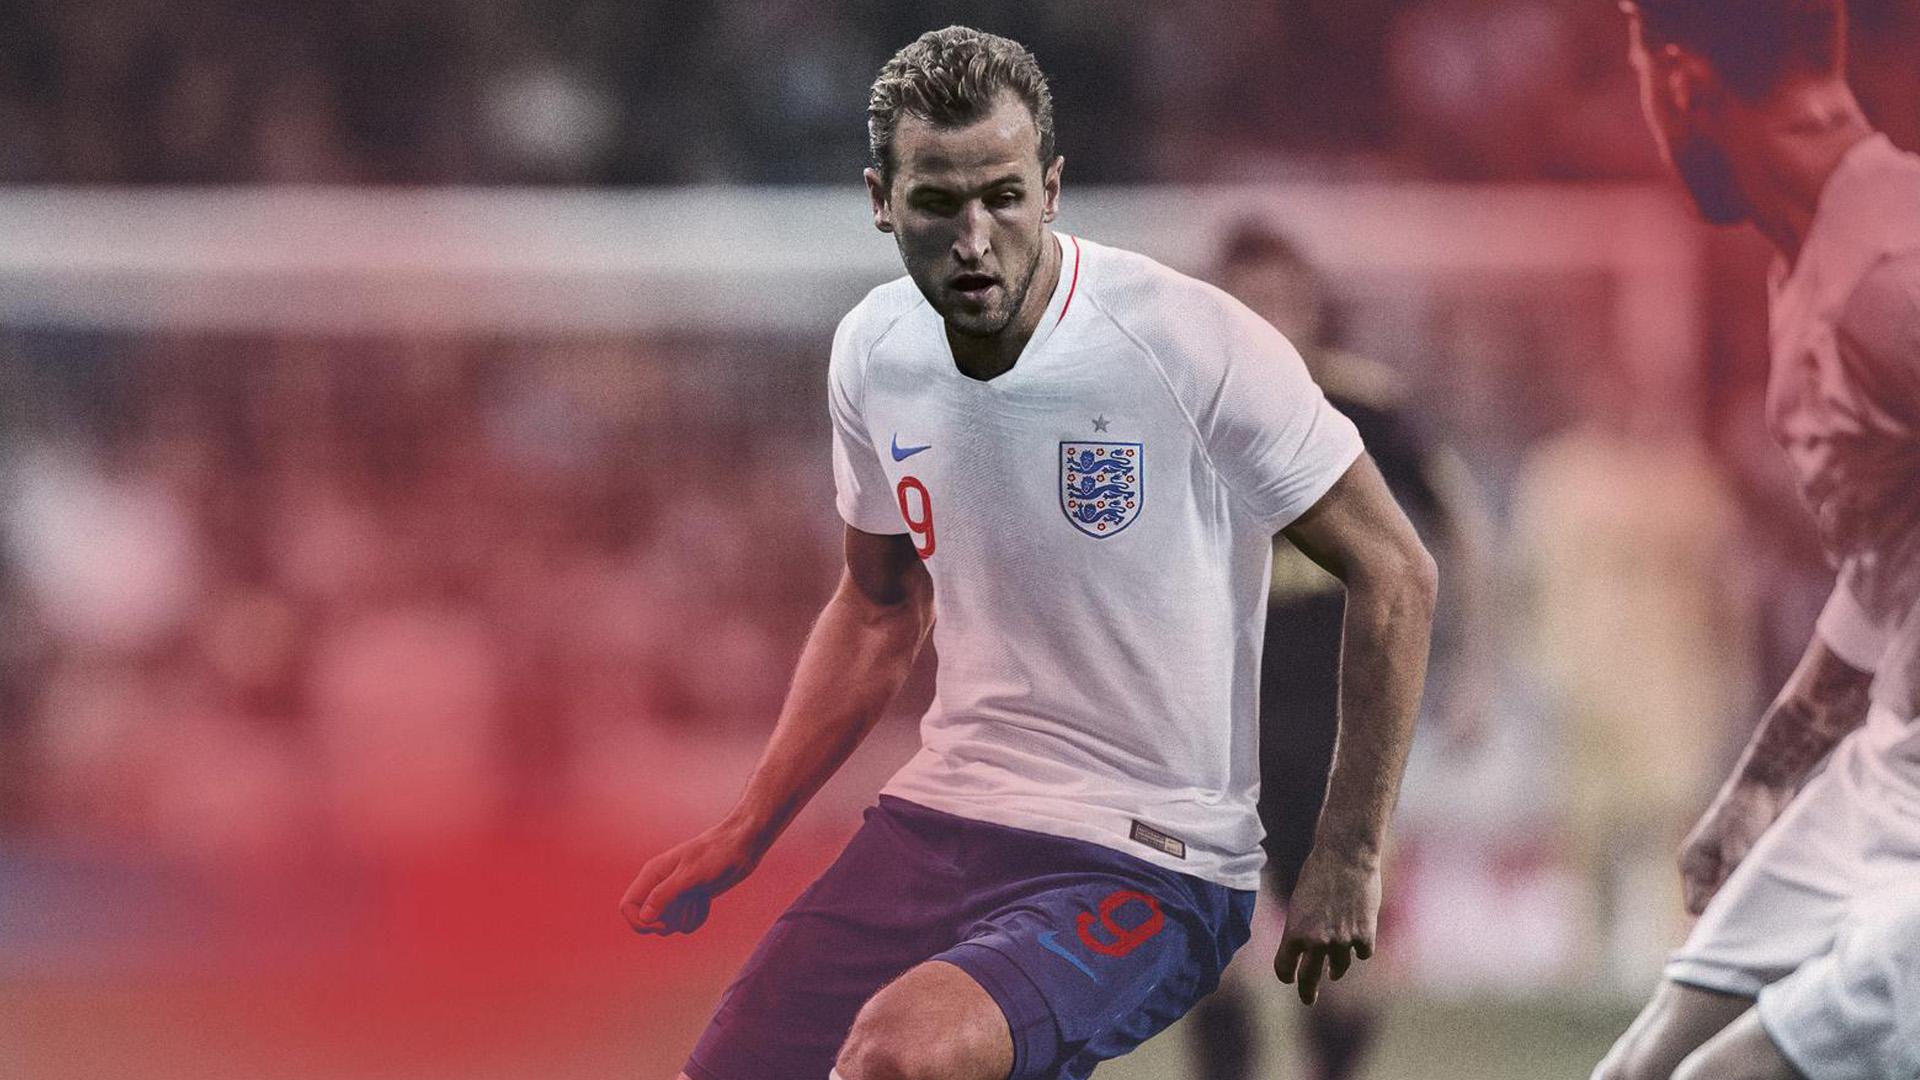 Inglaterra Camiseta Titular England Home Kit 2018